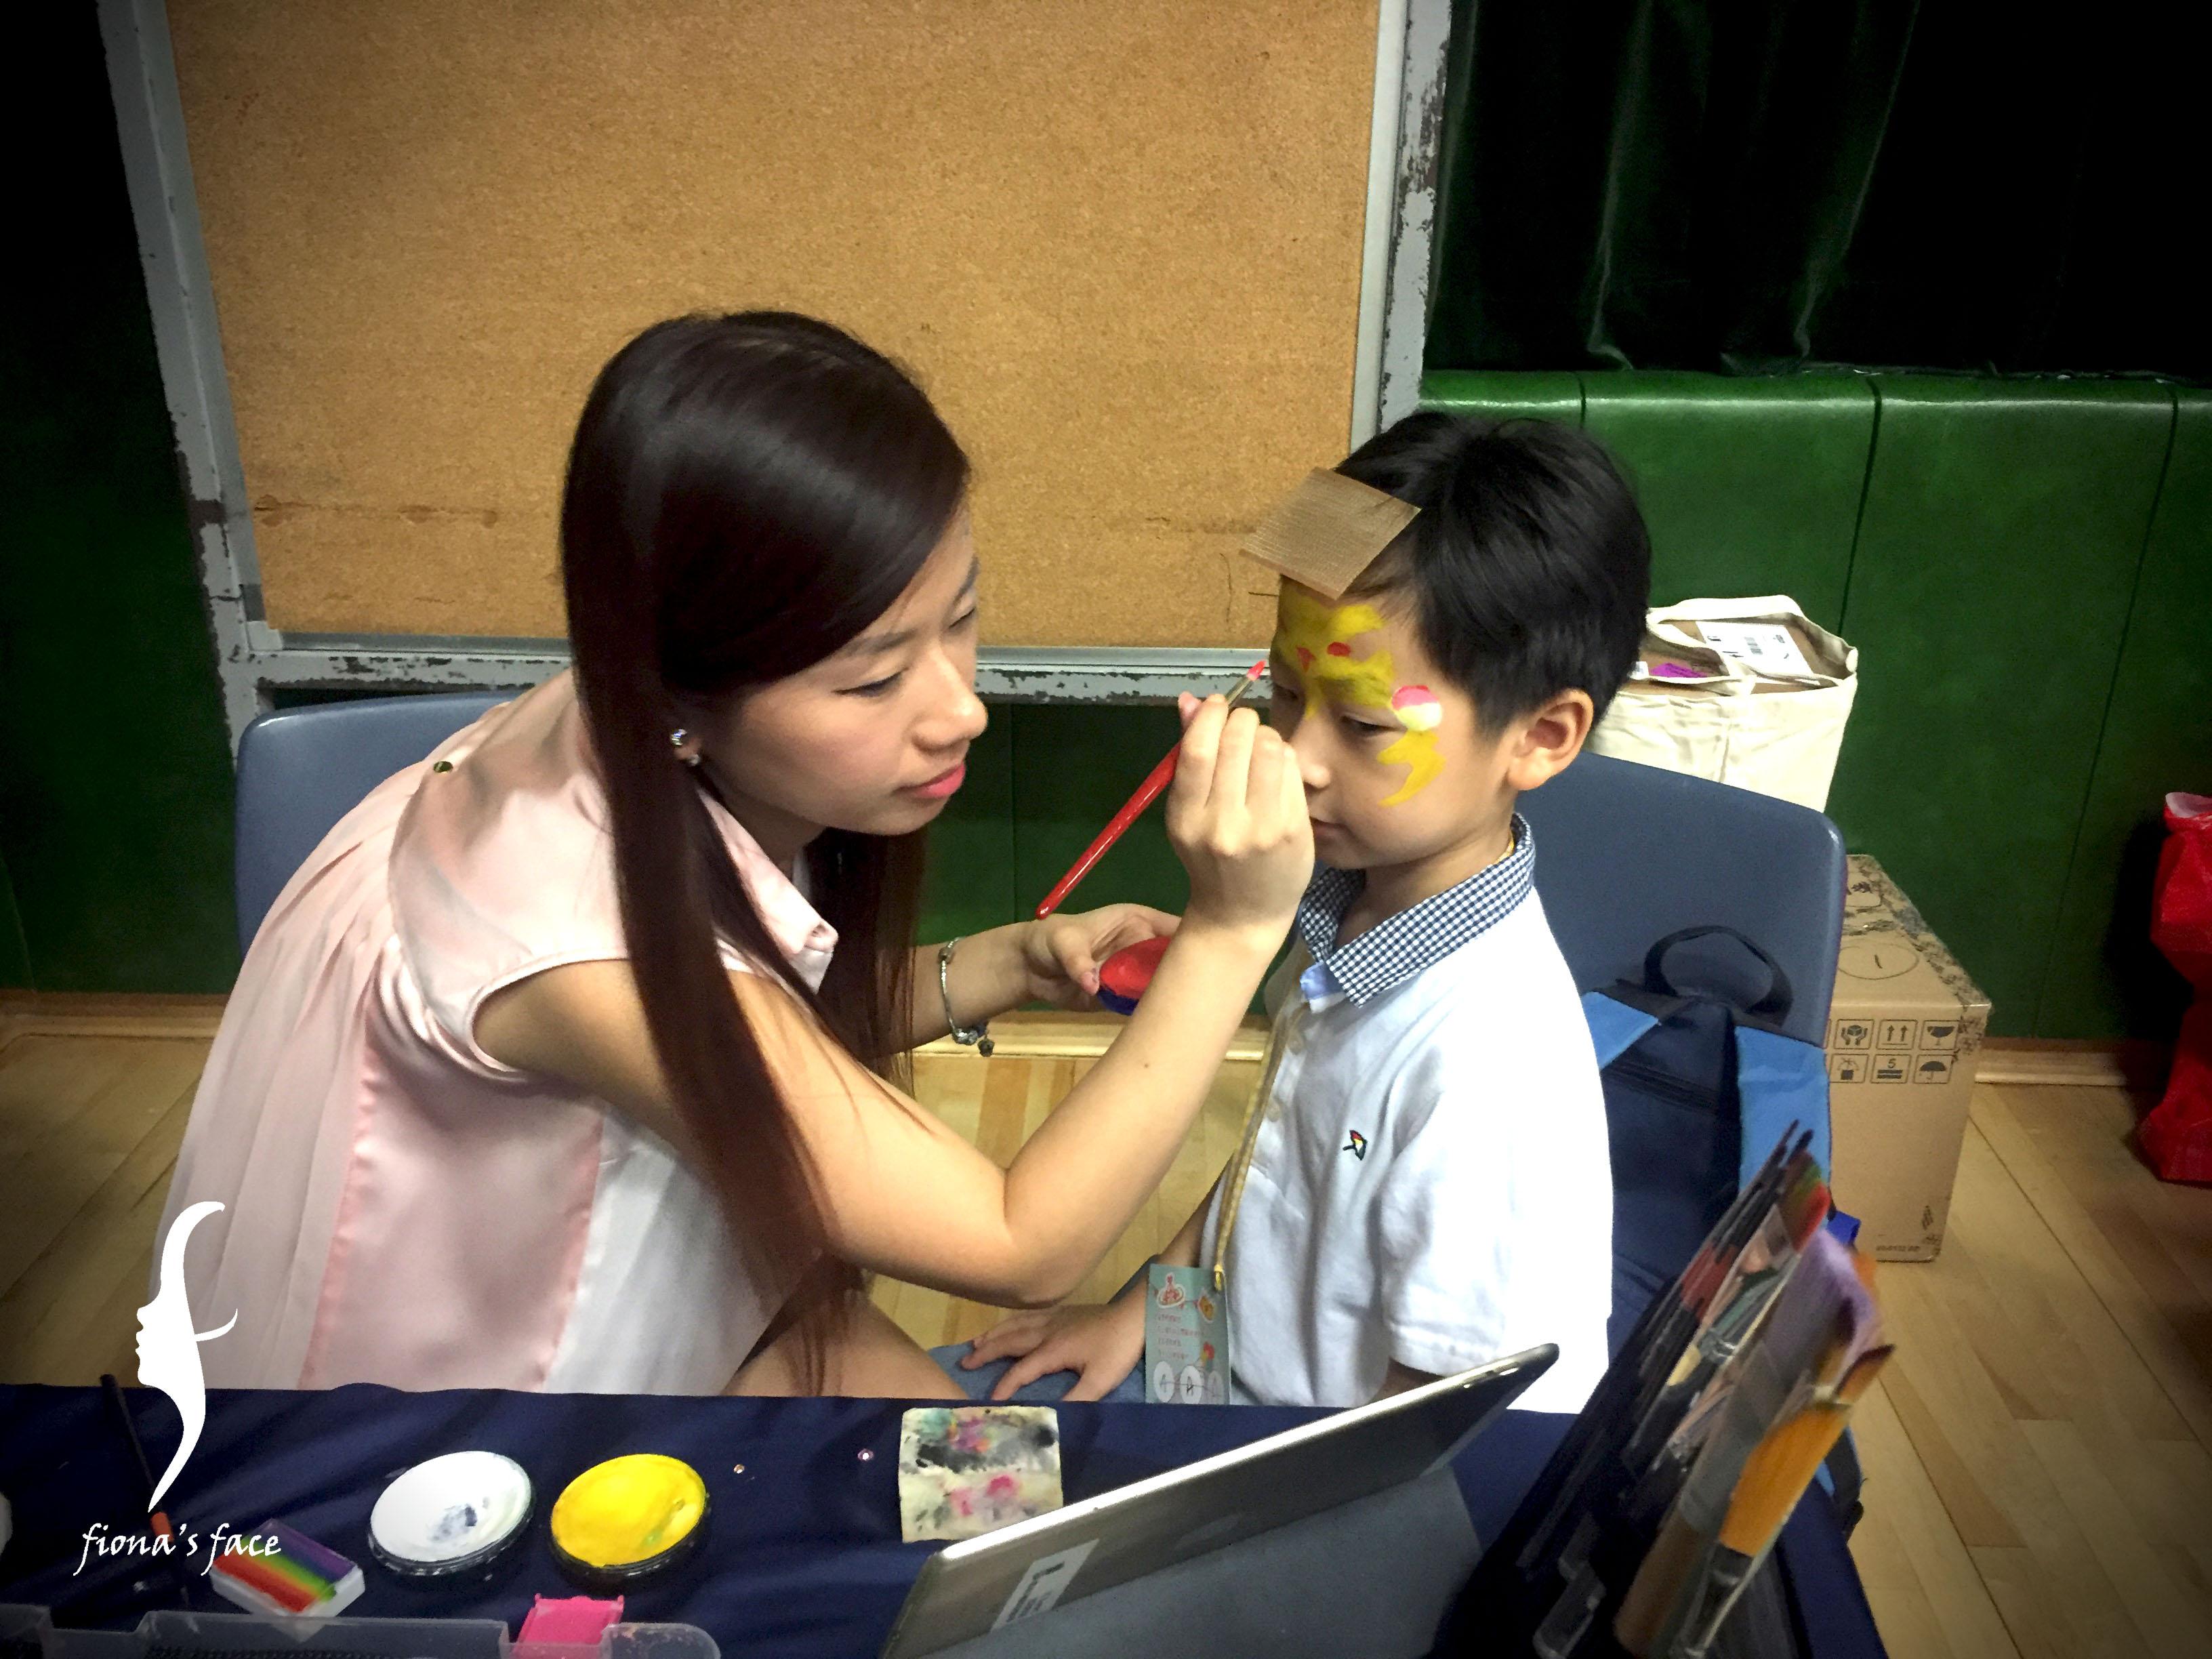 Fiona's face painting team - Kangi